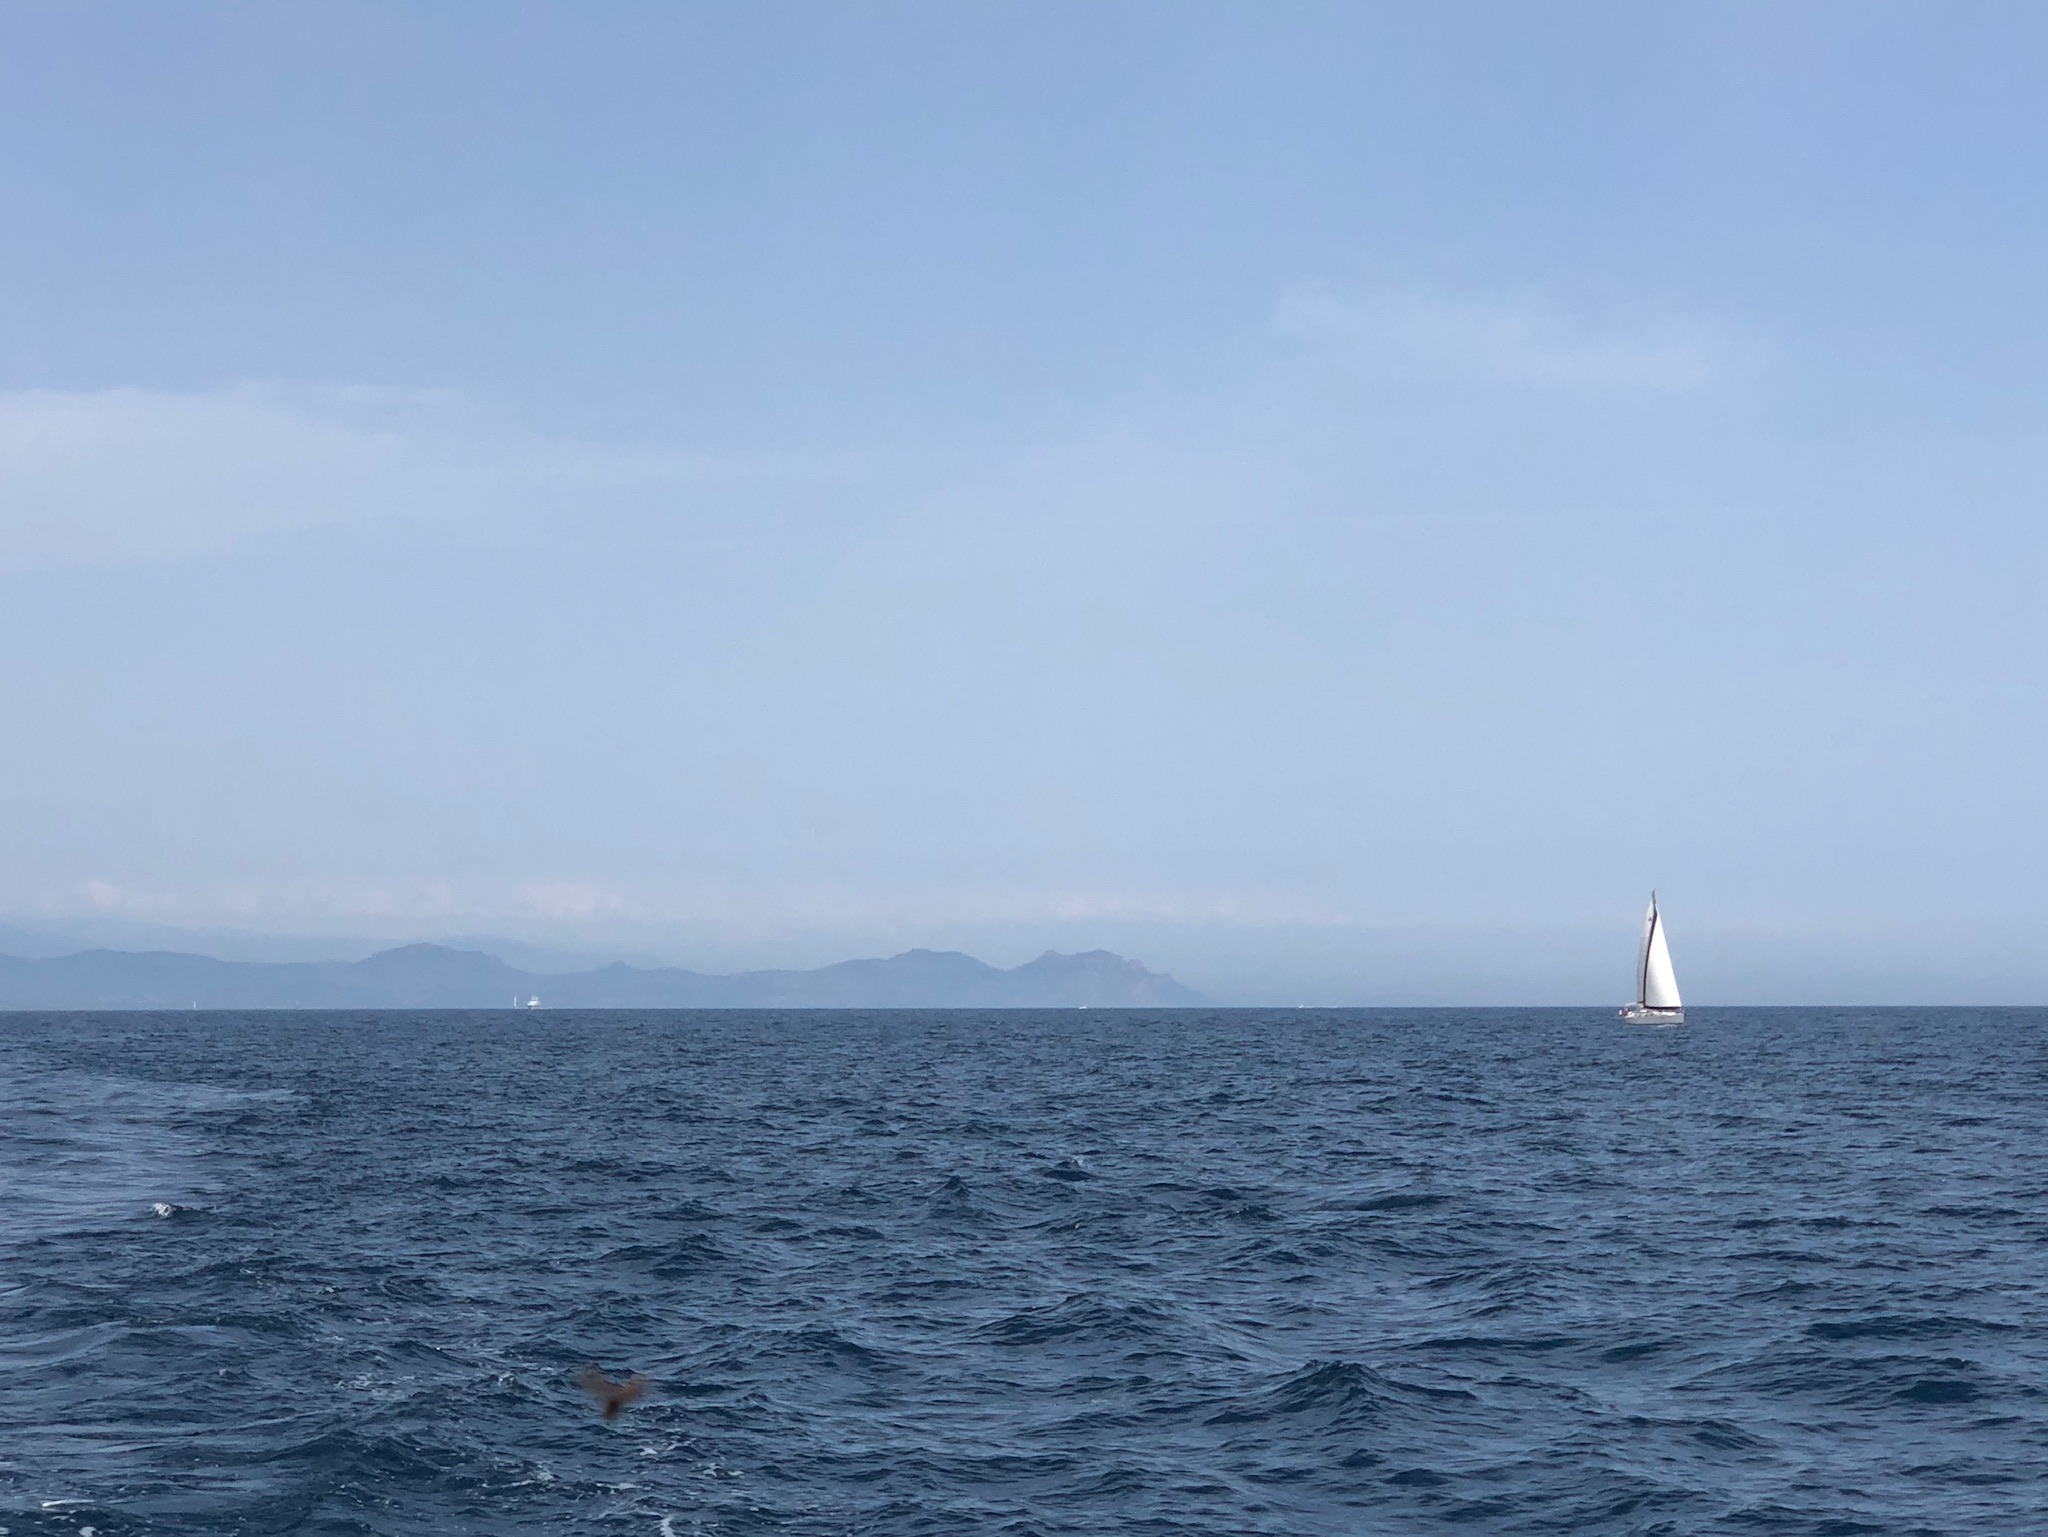 Photo_St.Tropez_SailBoat_View1.jpg